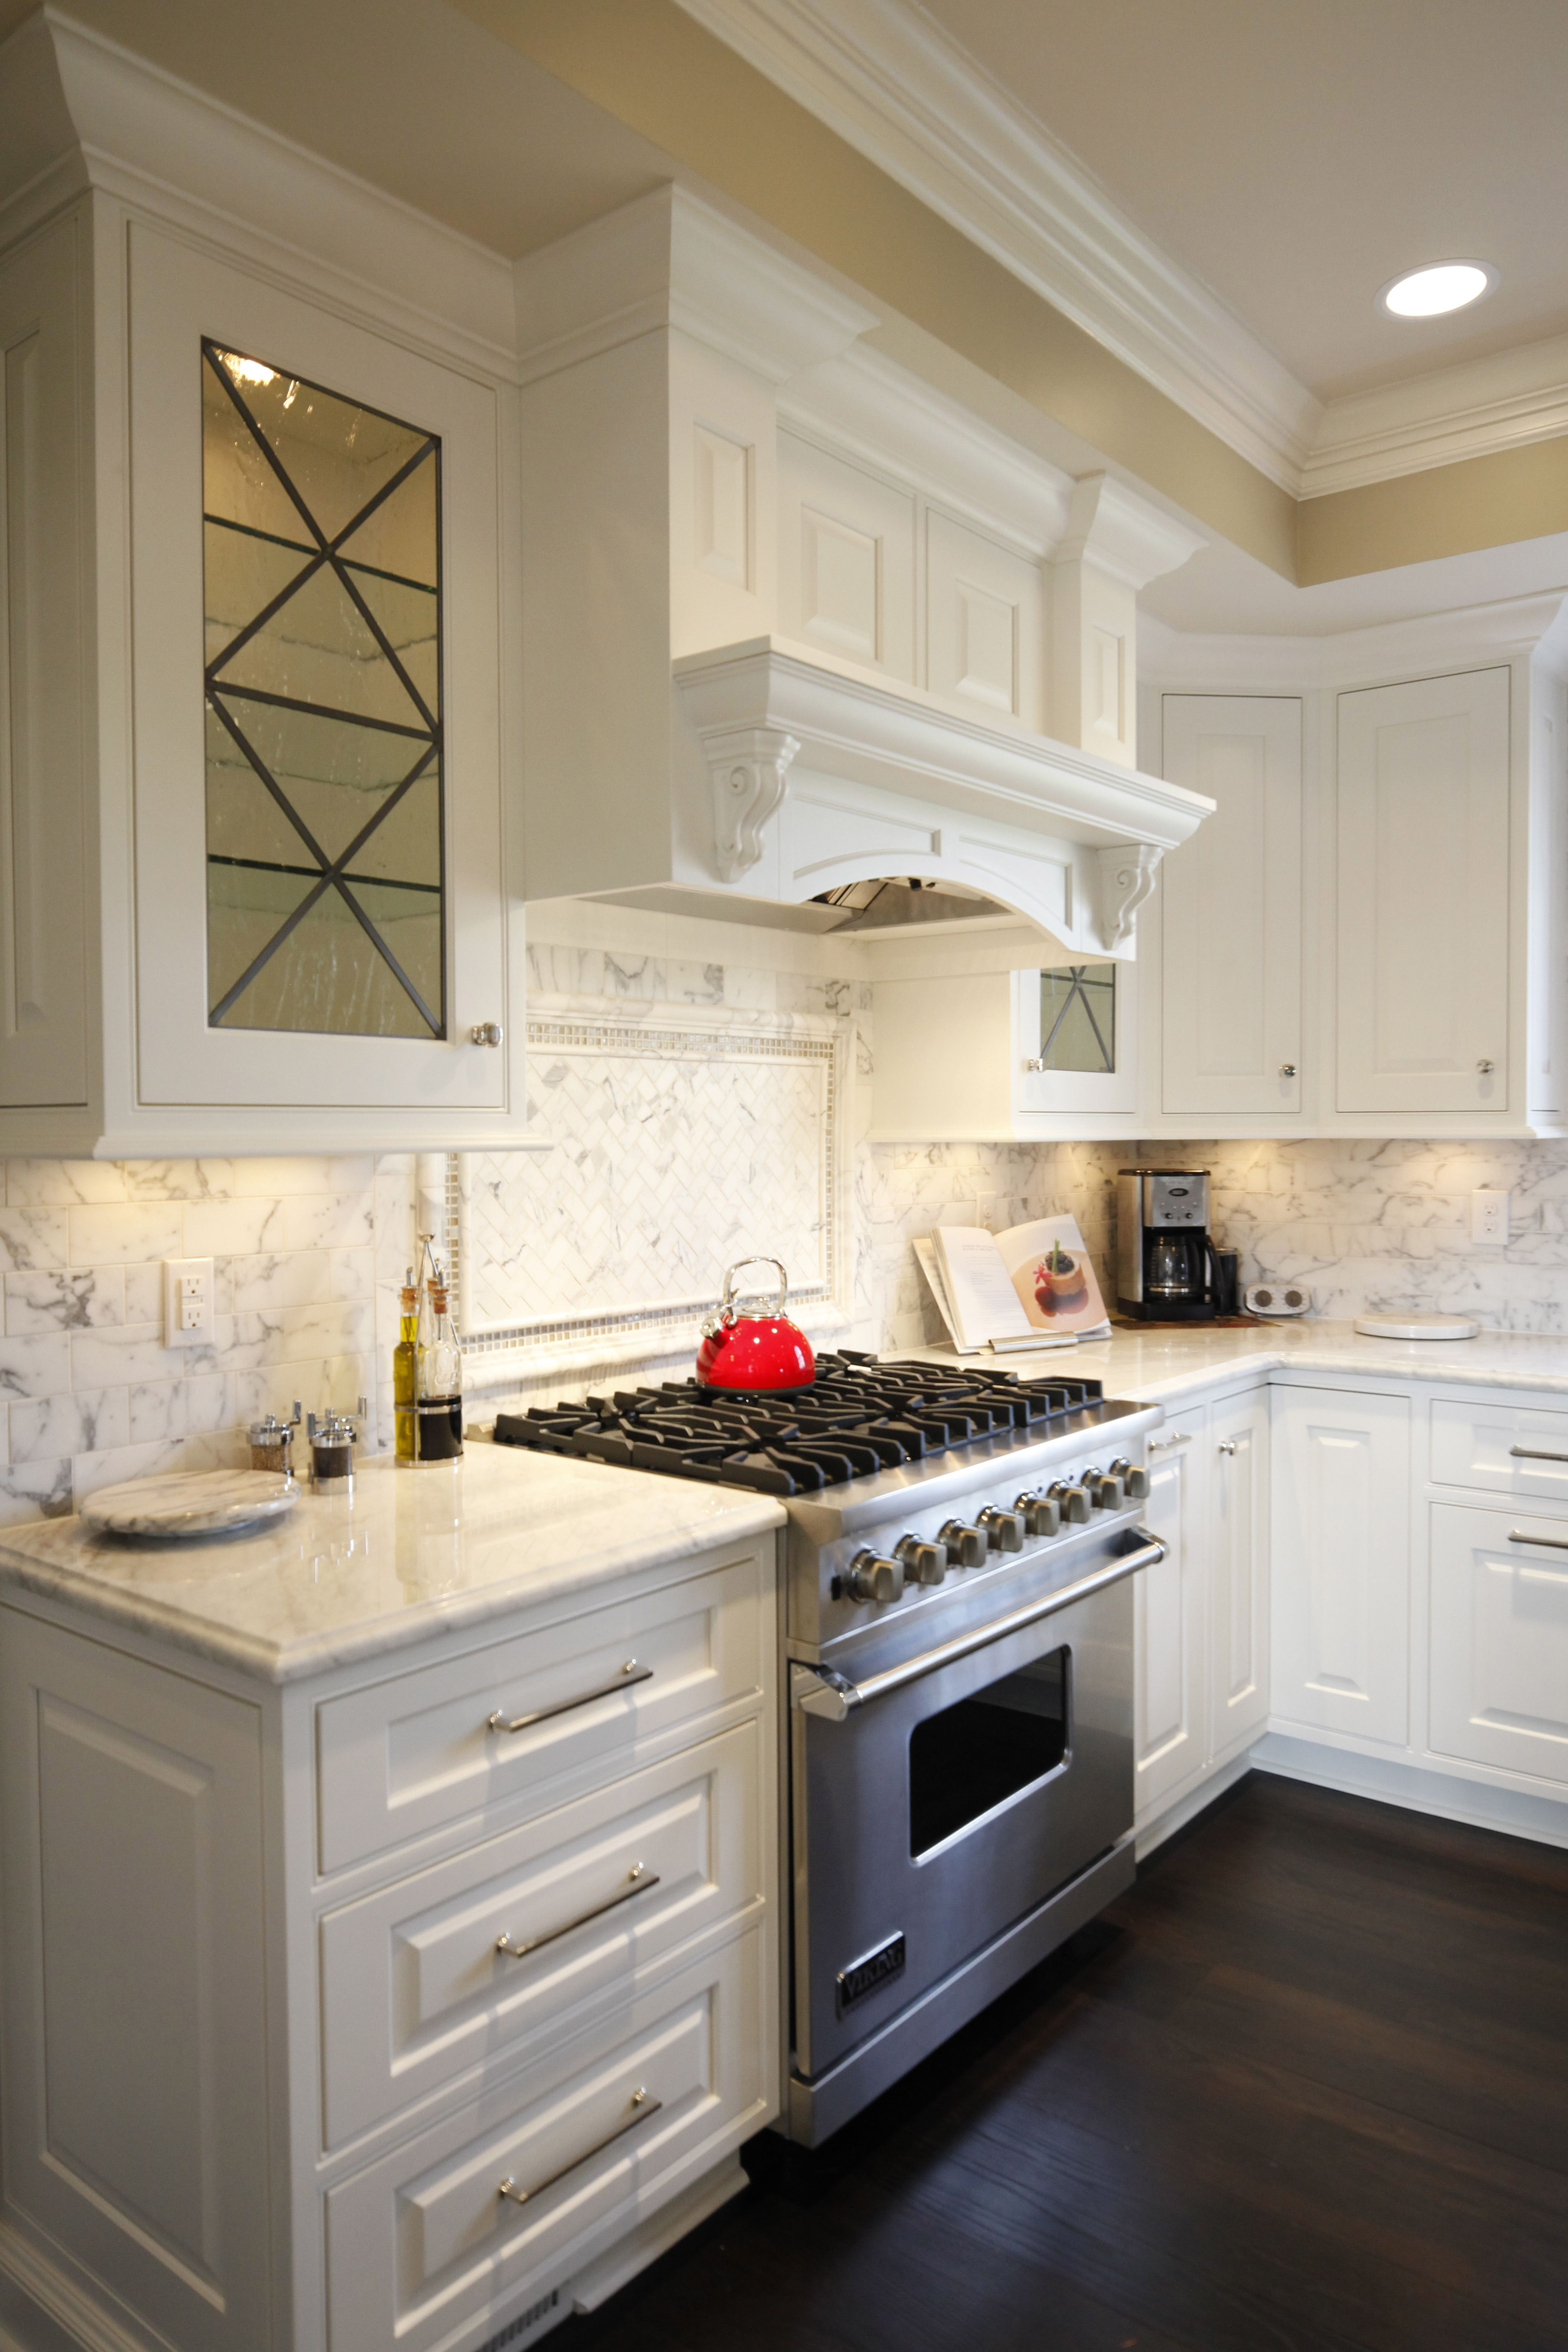 Stainless Steel Appliances, White Cabinets, Grabill Cabinets, Dark Hardwood  Flooring